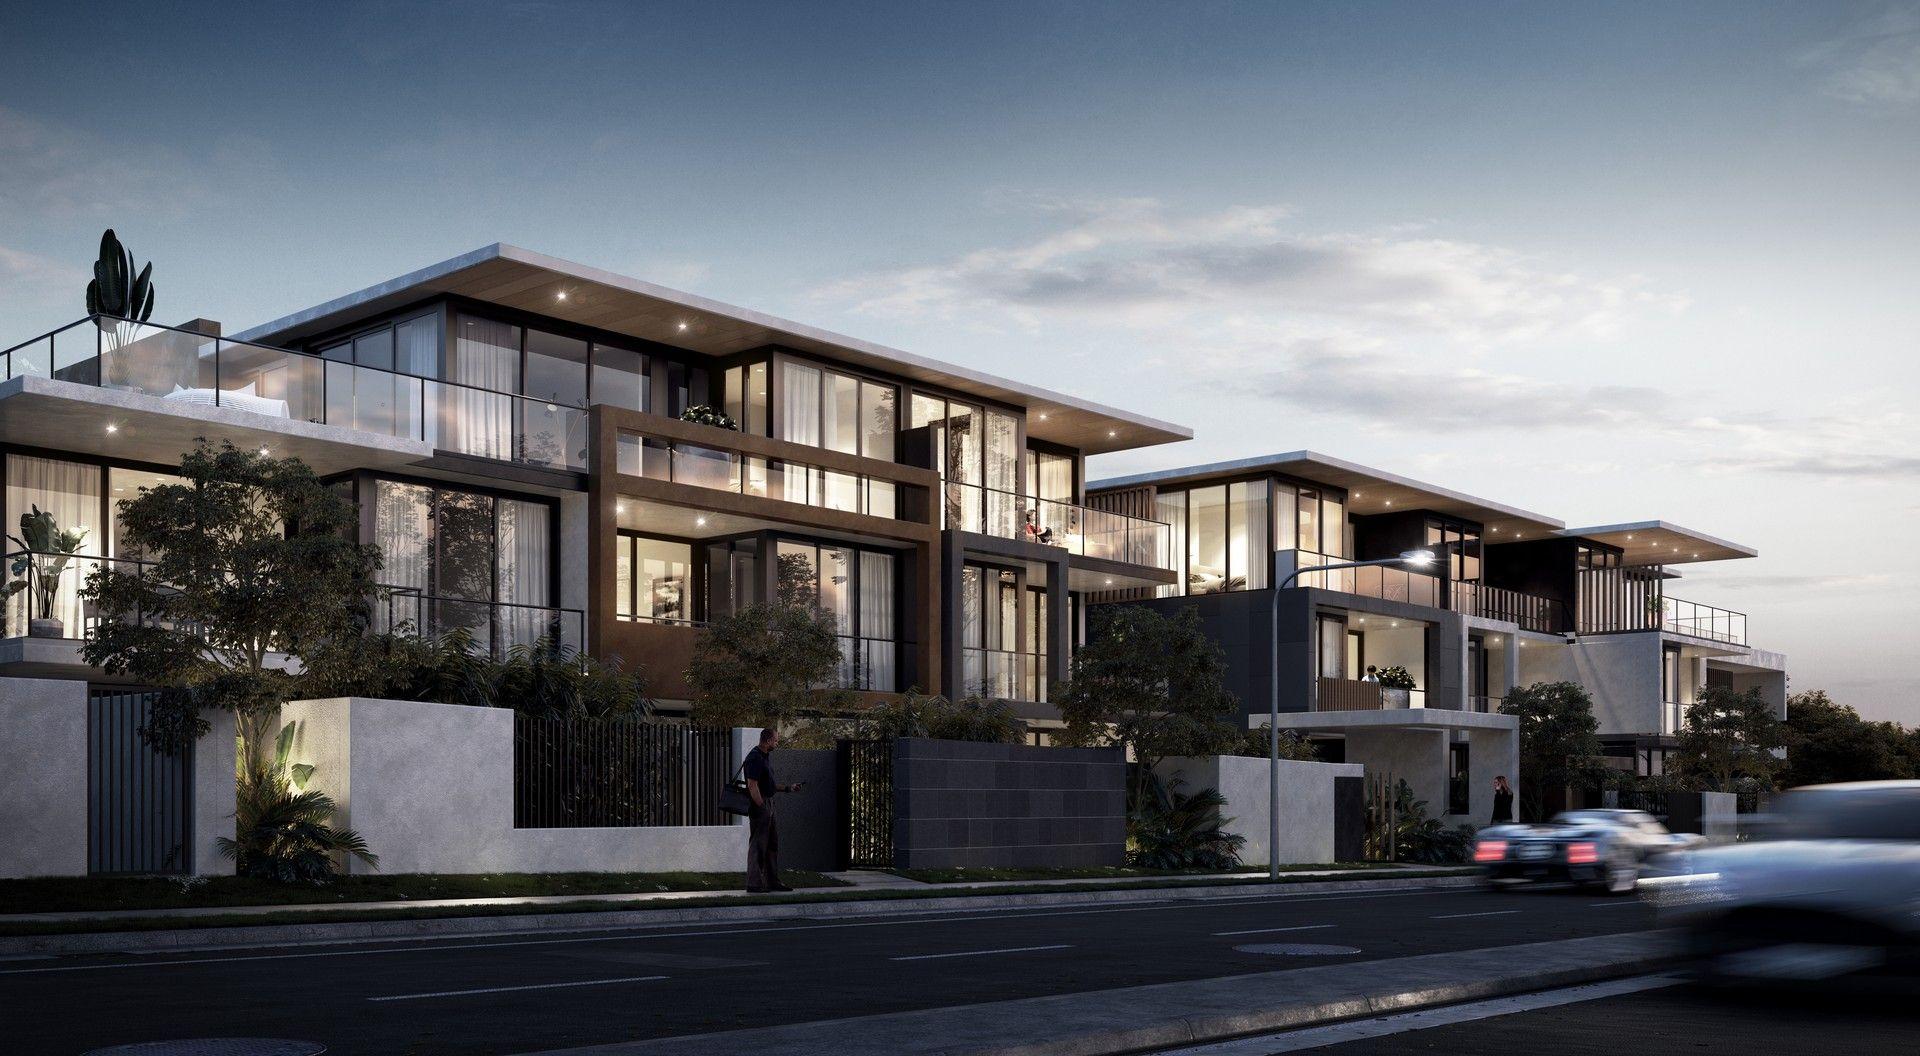 2/249 - 253 Ashmore Road, Benowa QLD 4217, Image 0